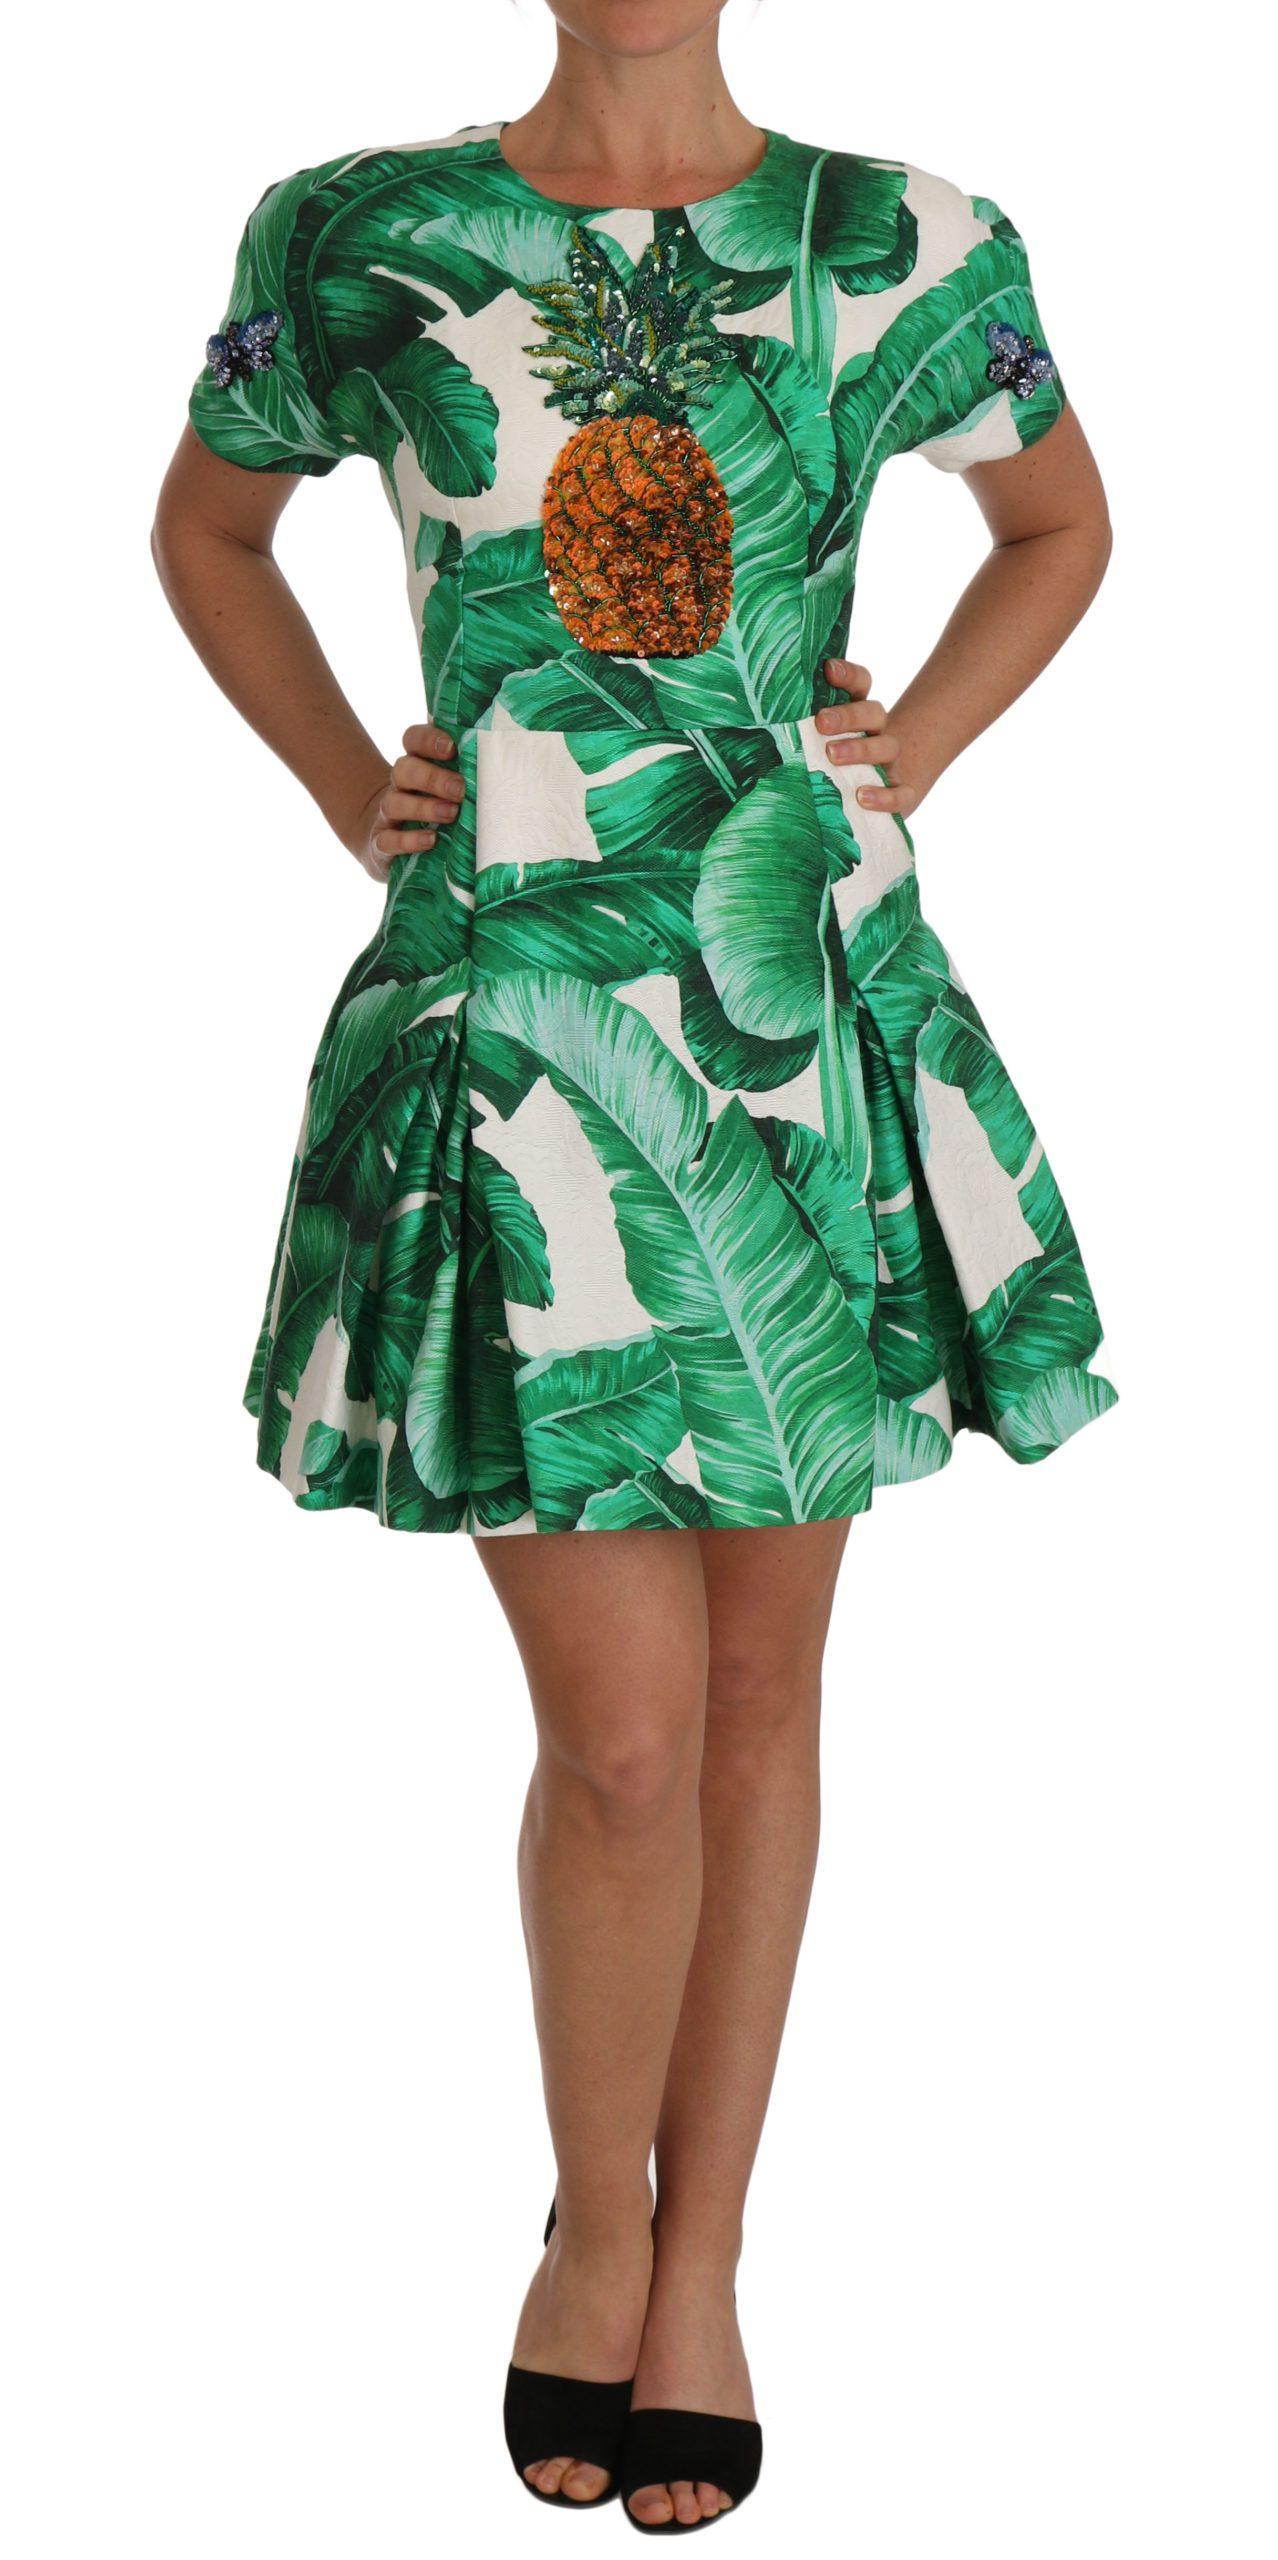 Dolce & Gabbana Women's A-Line Crystal Dress Green DR1429 - IT42|M